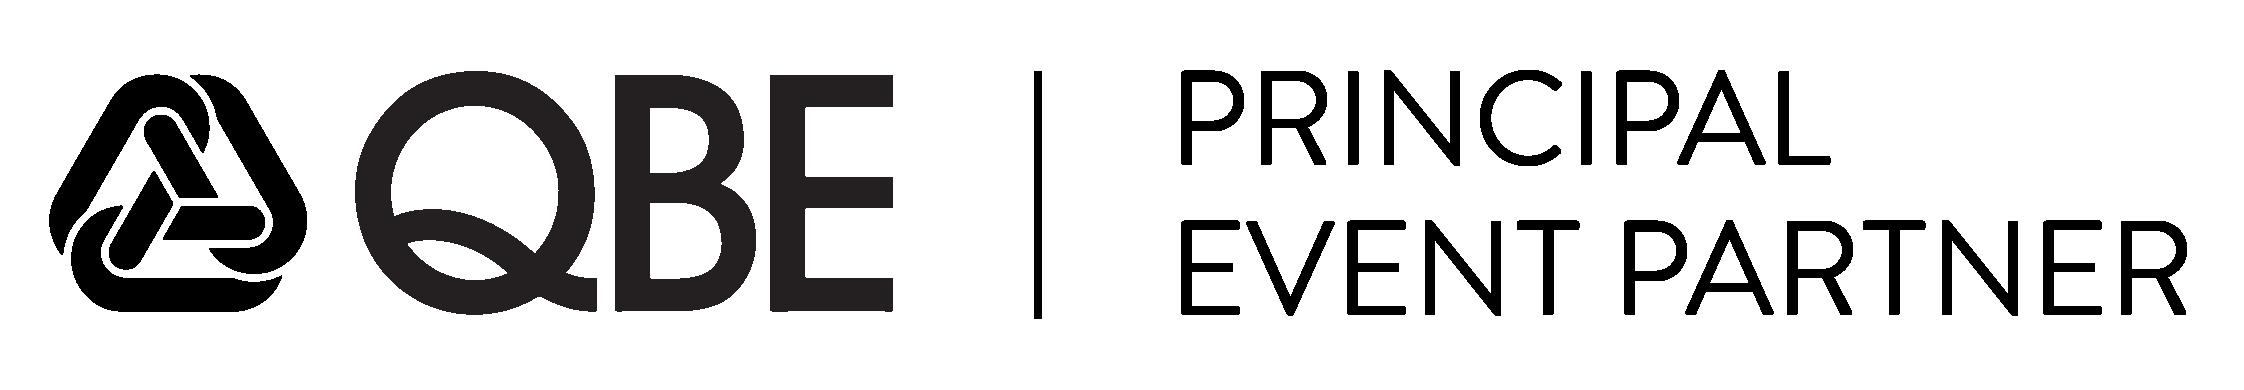 https://rfacdn.nz/conventions/assets/media/qbe-principal-event-partner-logo-black.png